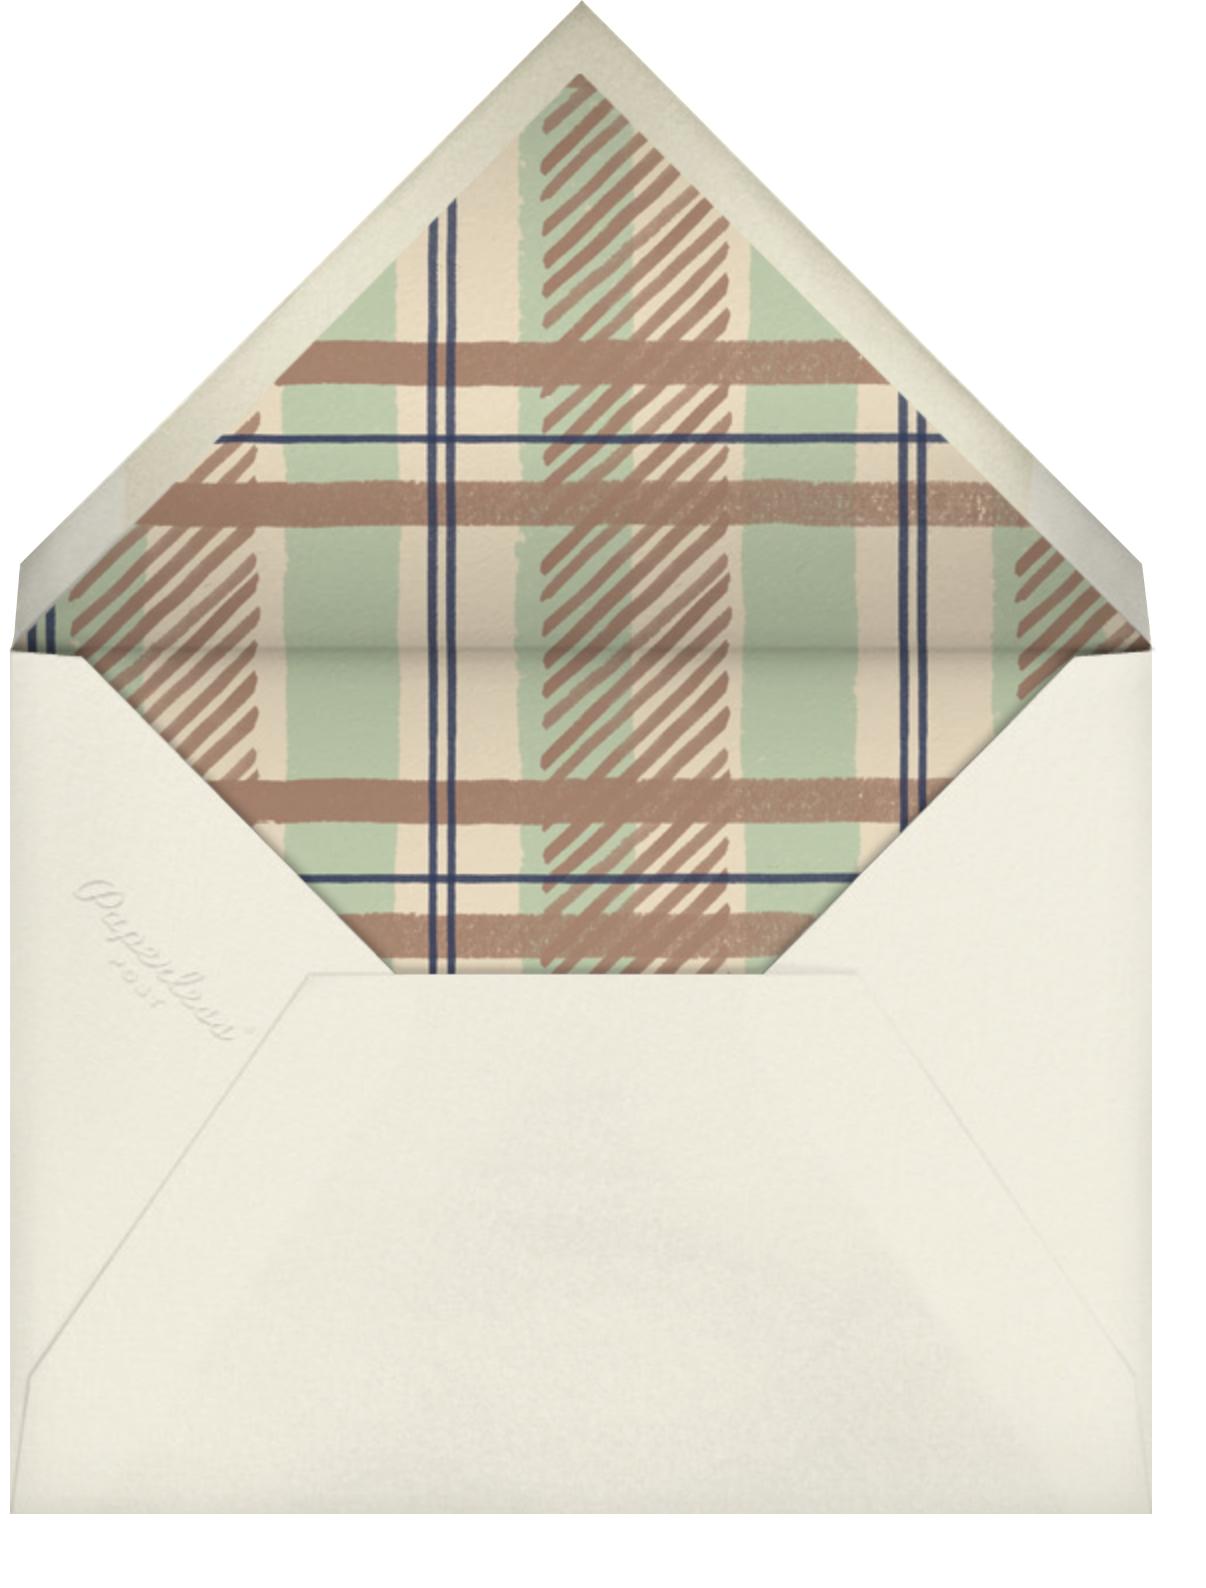 Pantanela - Paperless Post - Adult birthday - envelope back